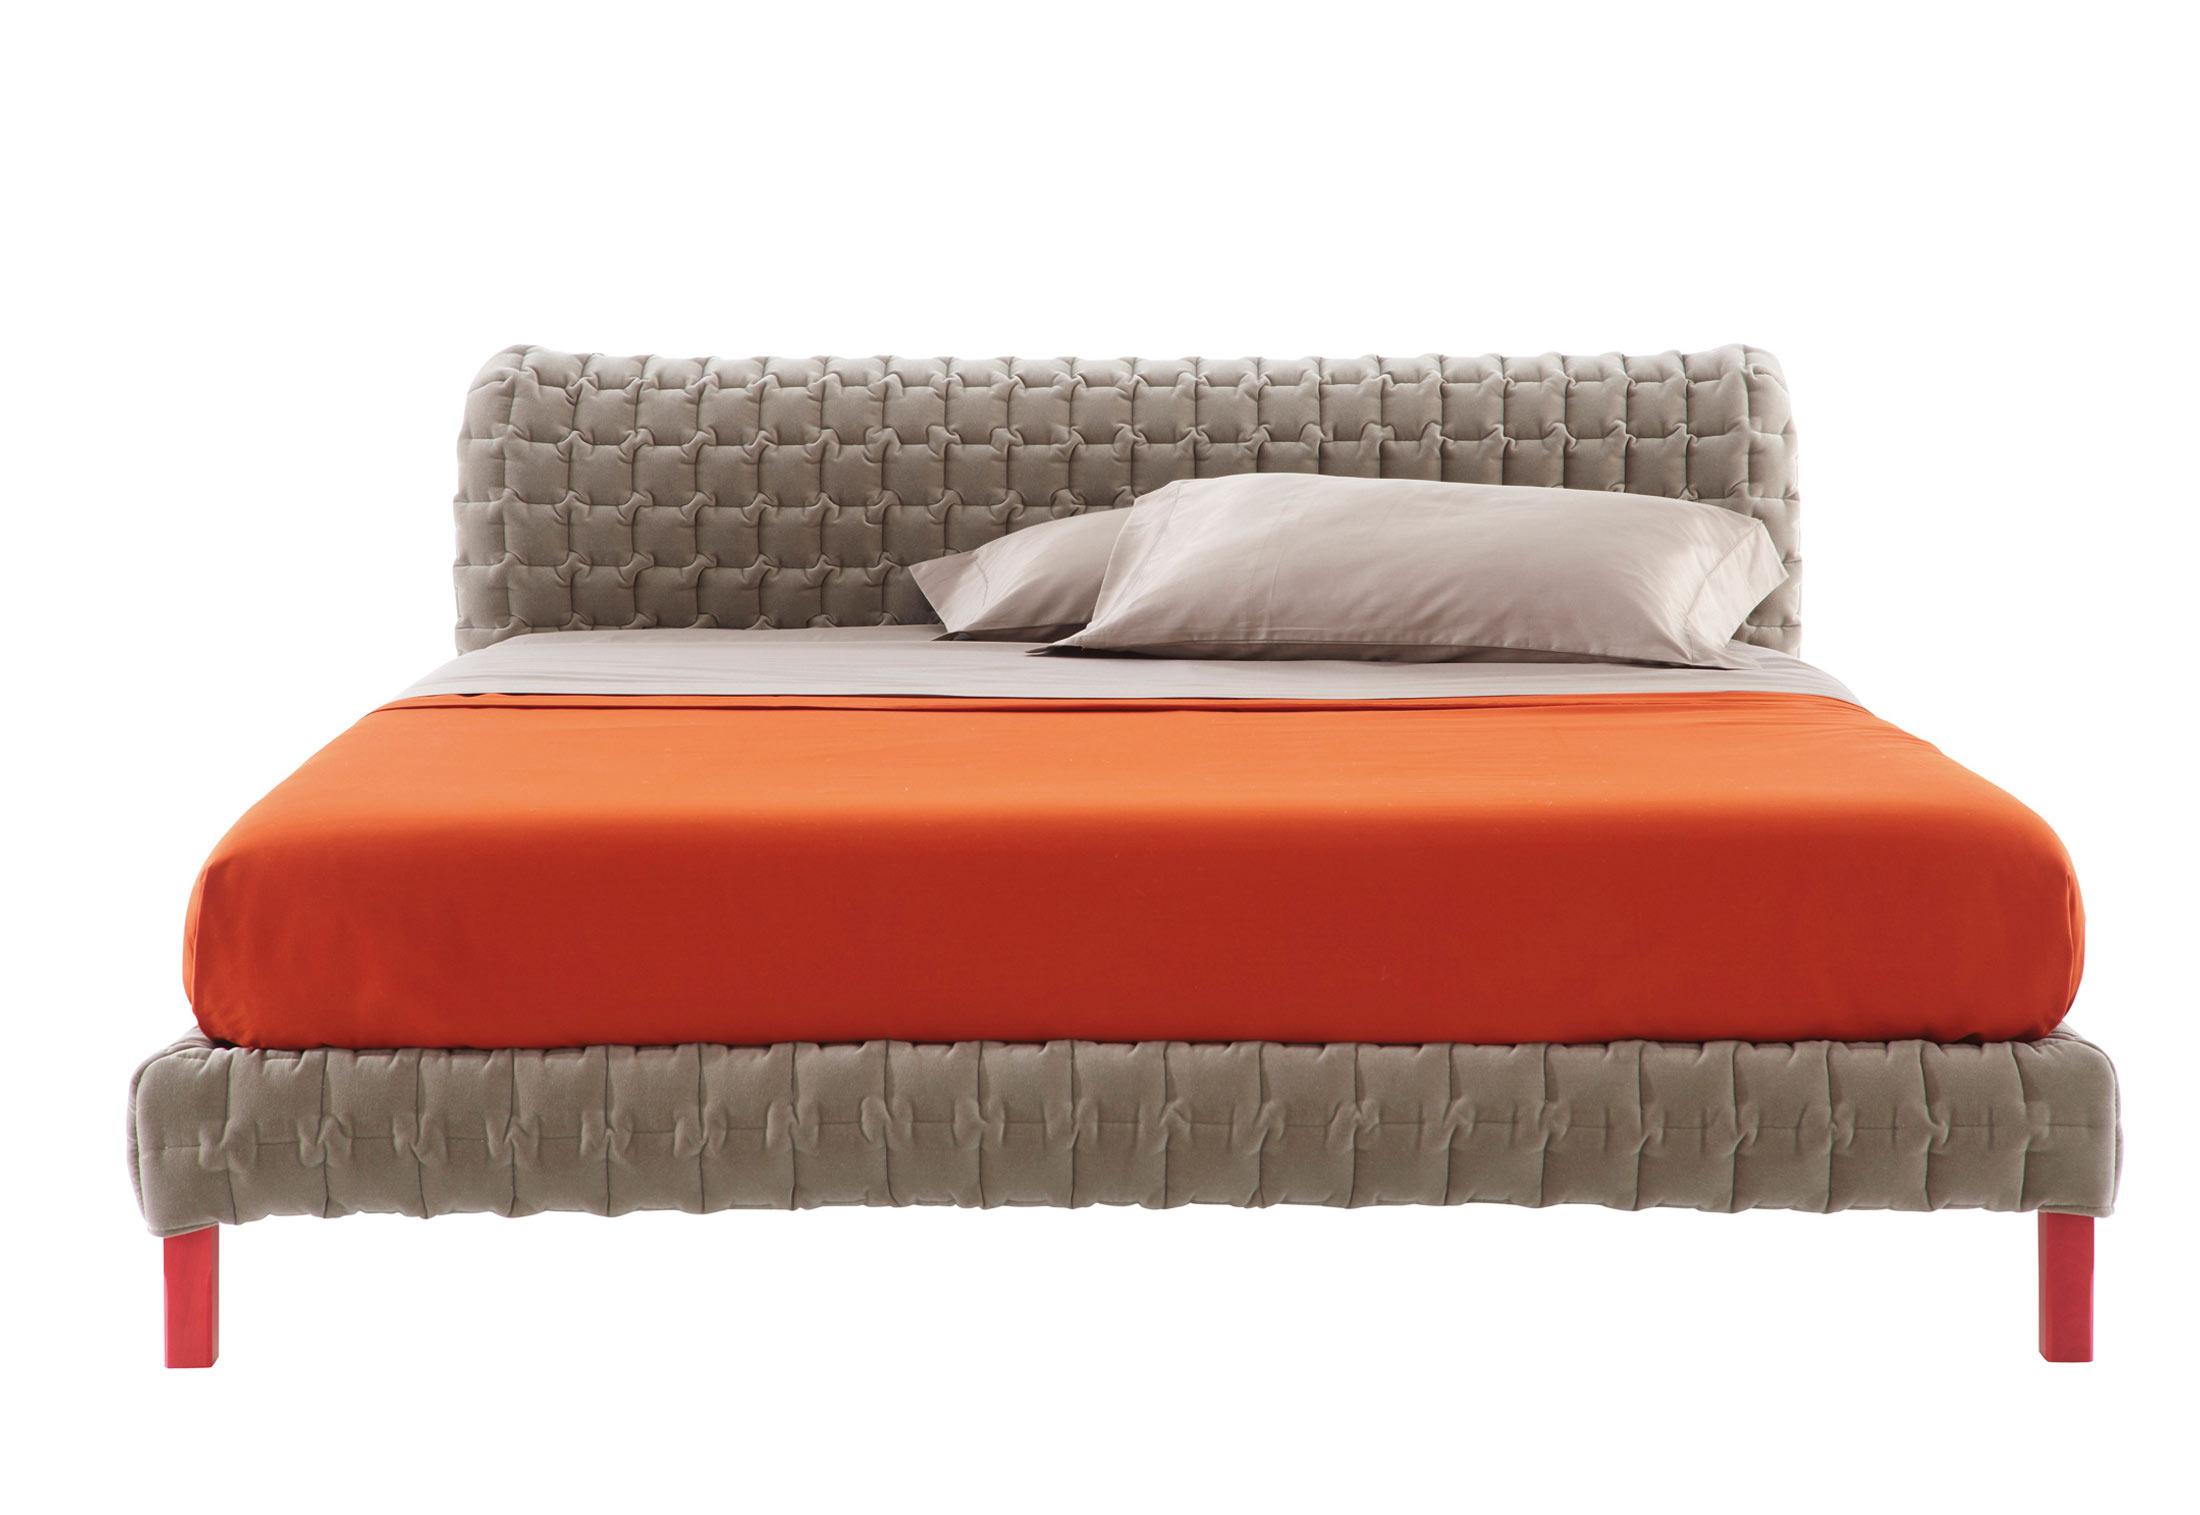 Ruche Bed By Ligne Roset Stylepark - Maly-platform-bed-by-ligne-roset